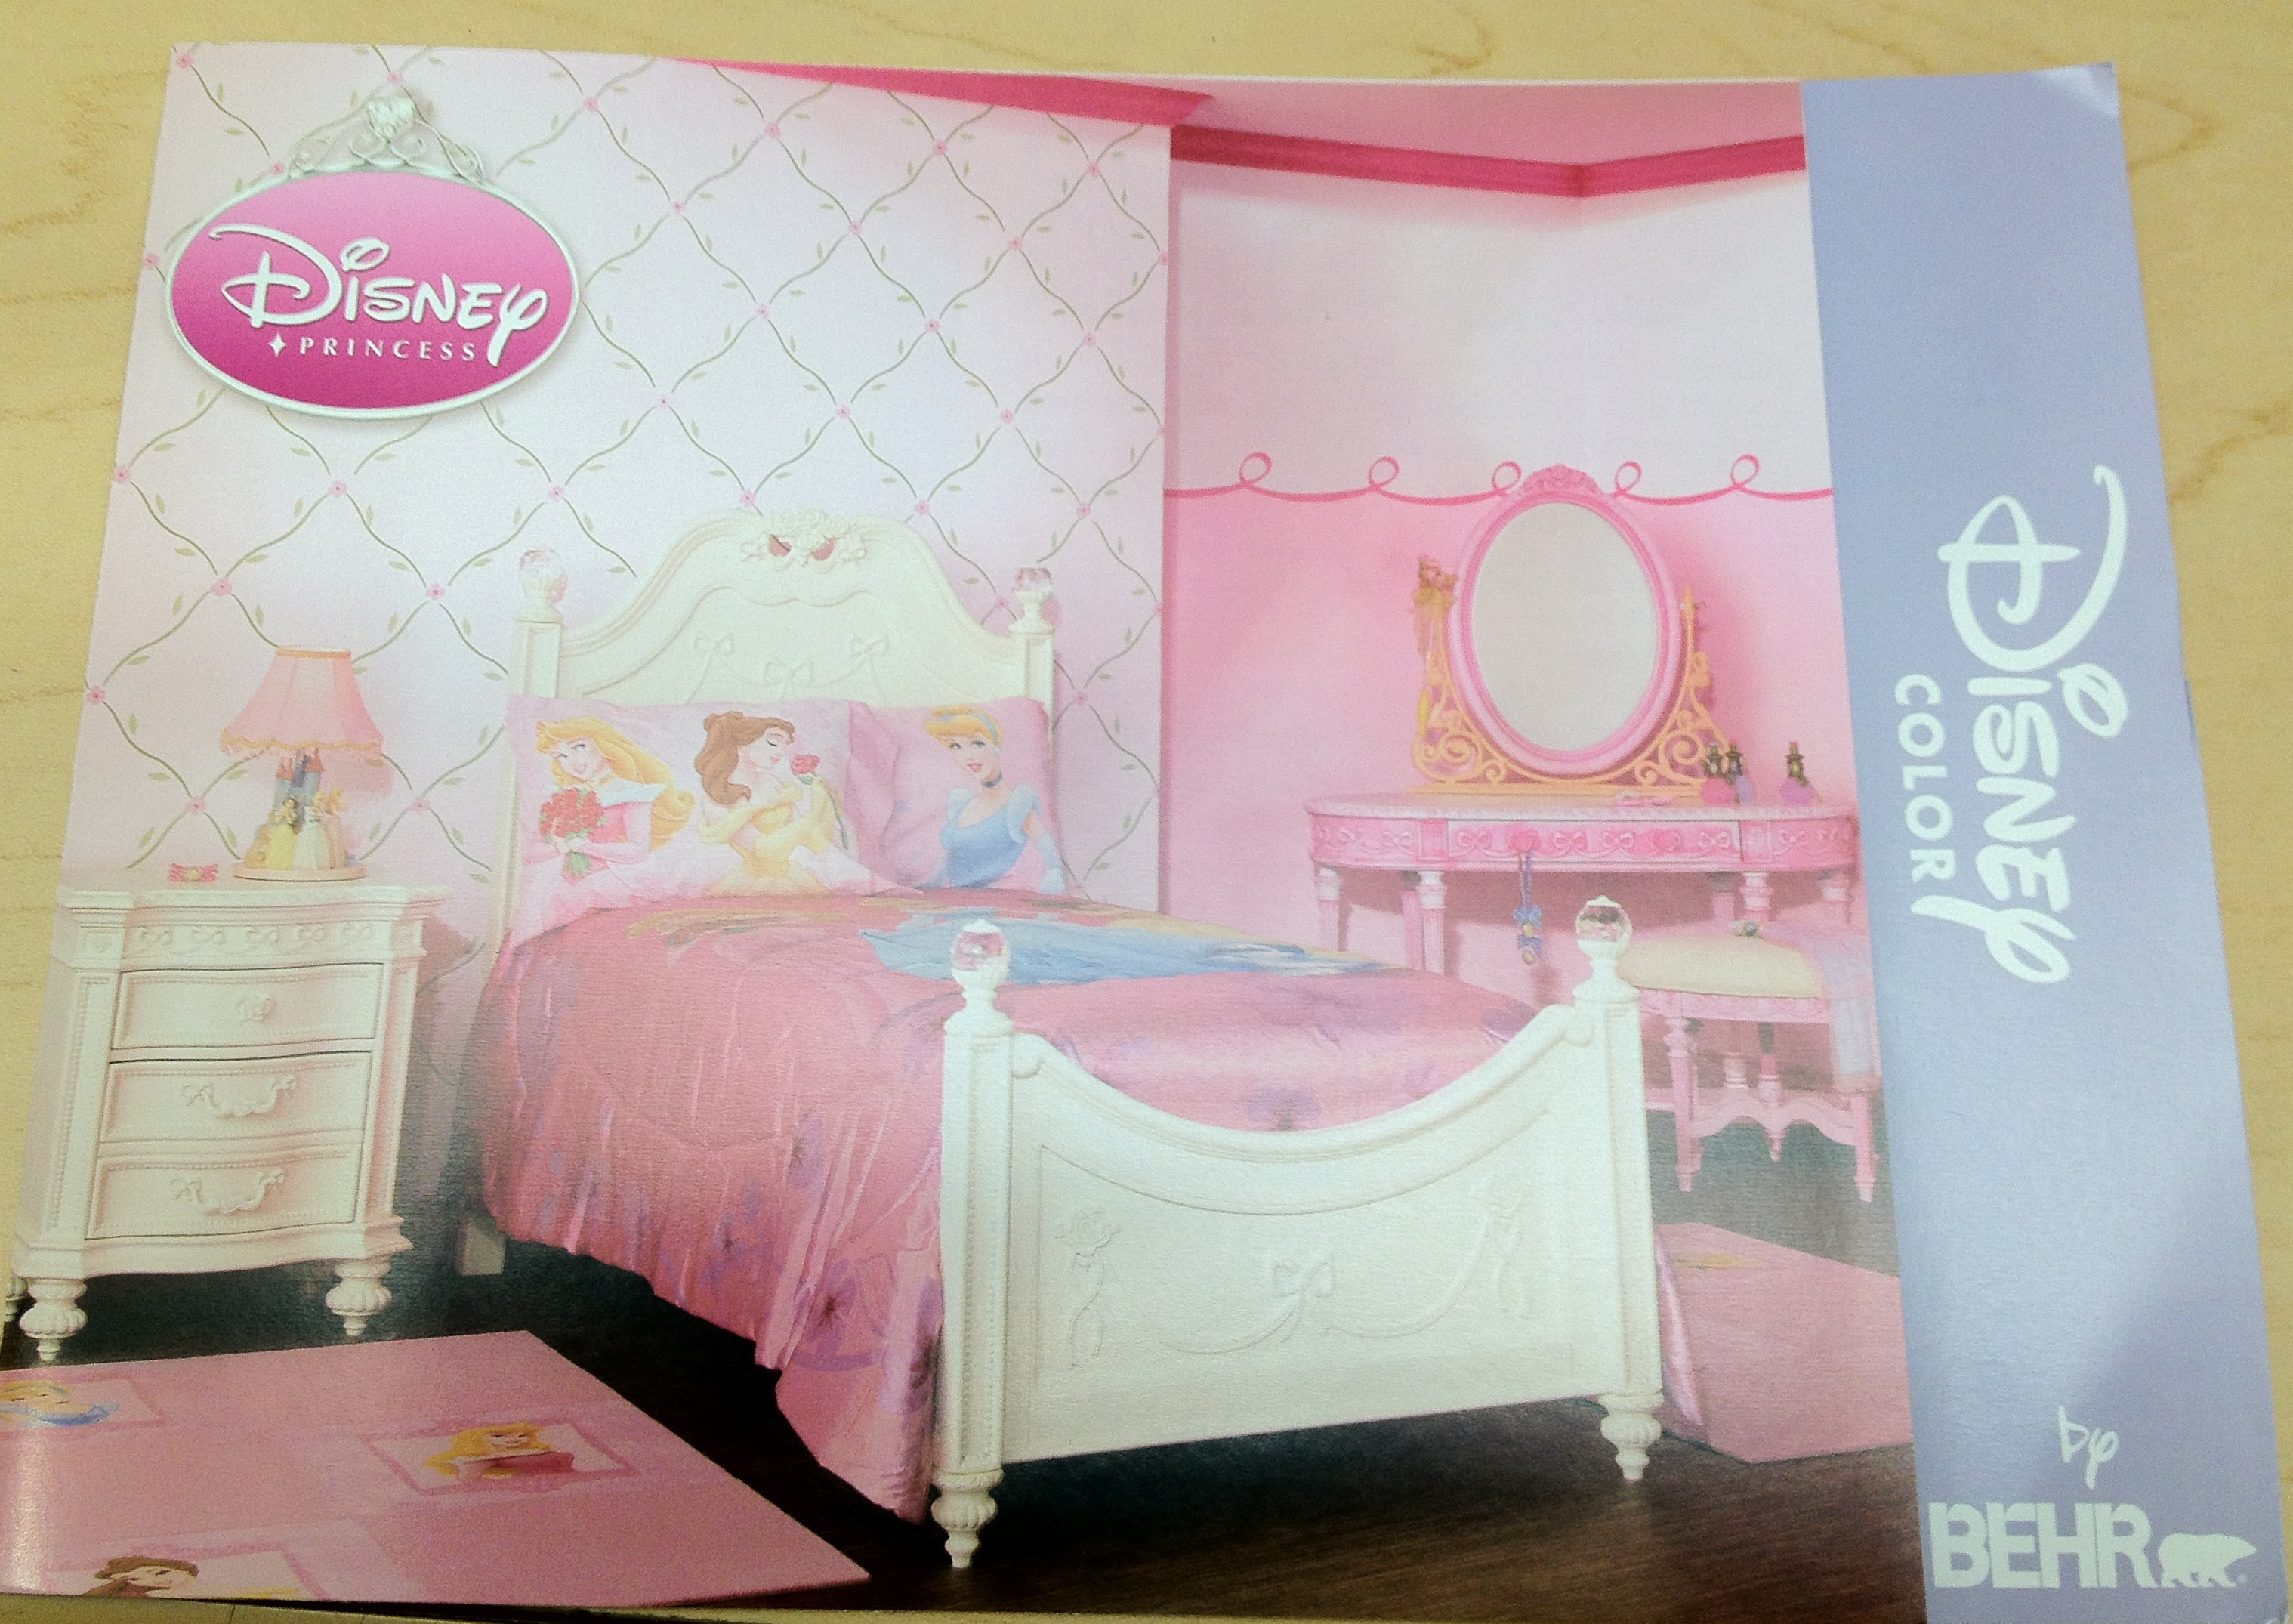 Lifestyle Branding And The Disney Princess Megabrand Dr